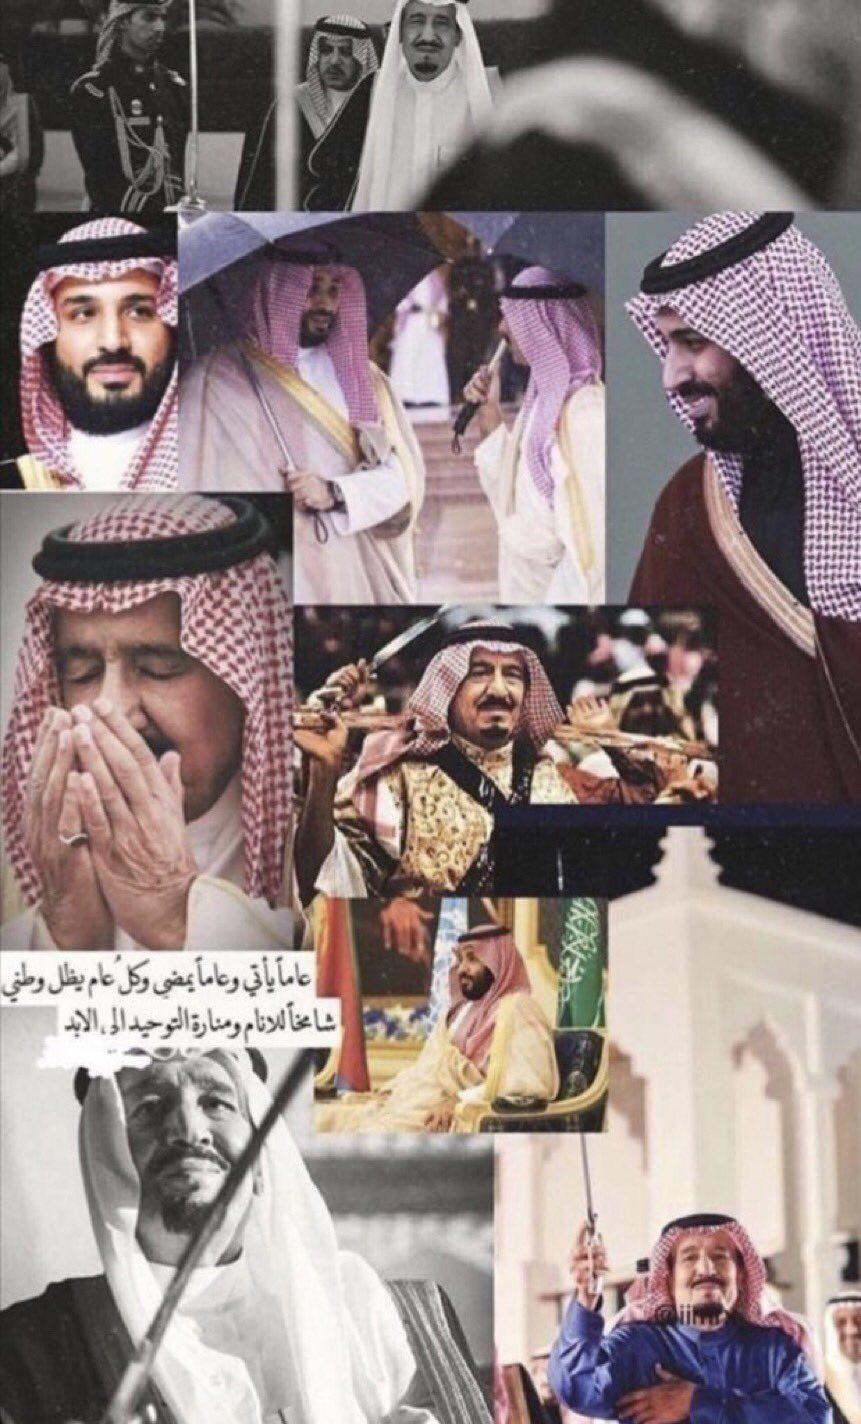 Wafa Al Harbi On Twitter Ksa Saudi Arabia King Salman Saudi Arabia National Day Saudi